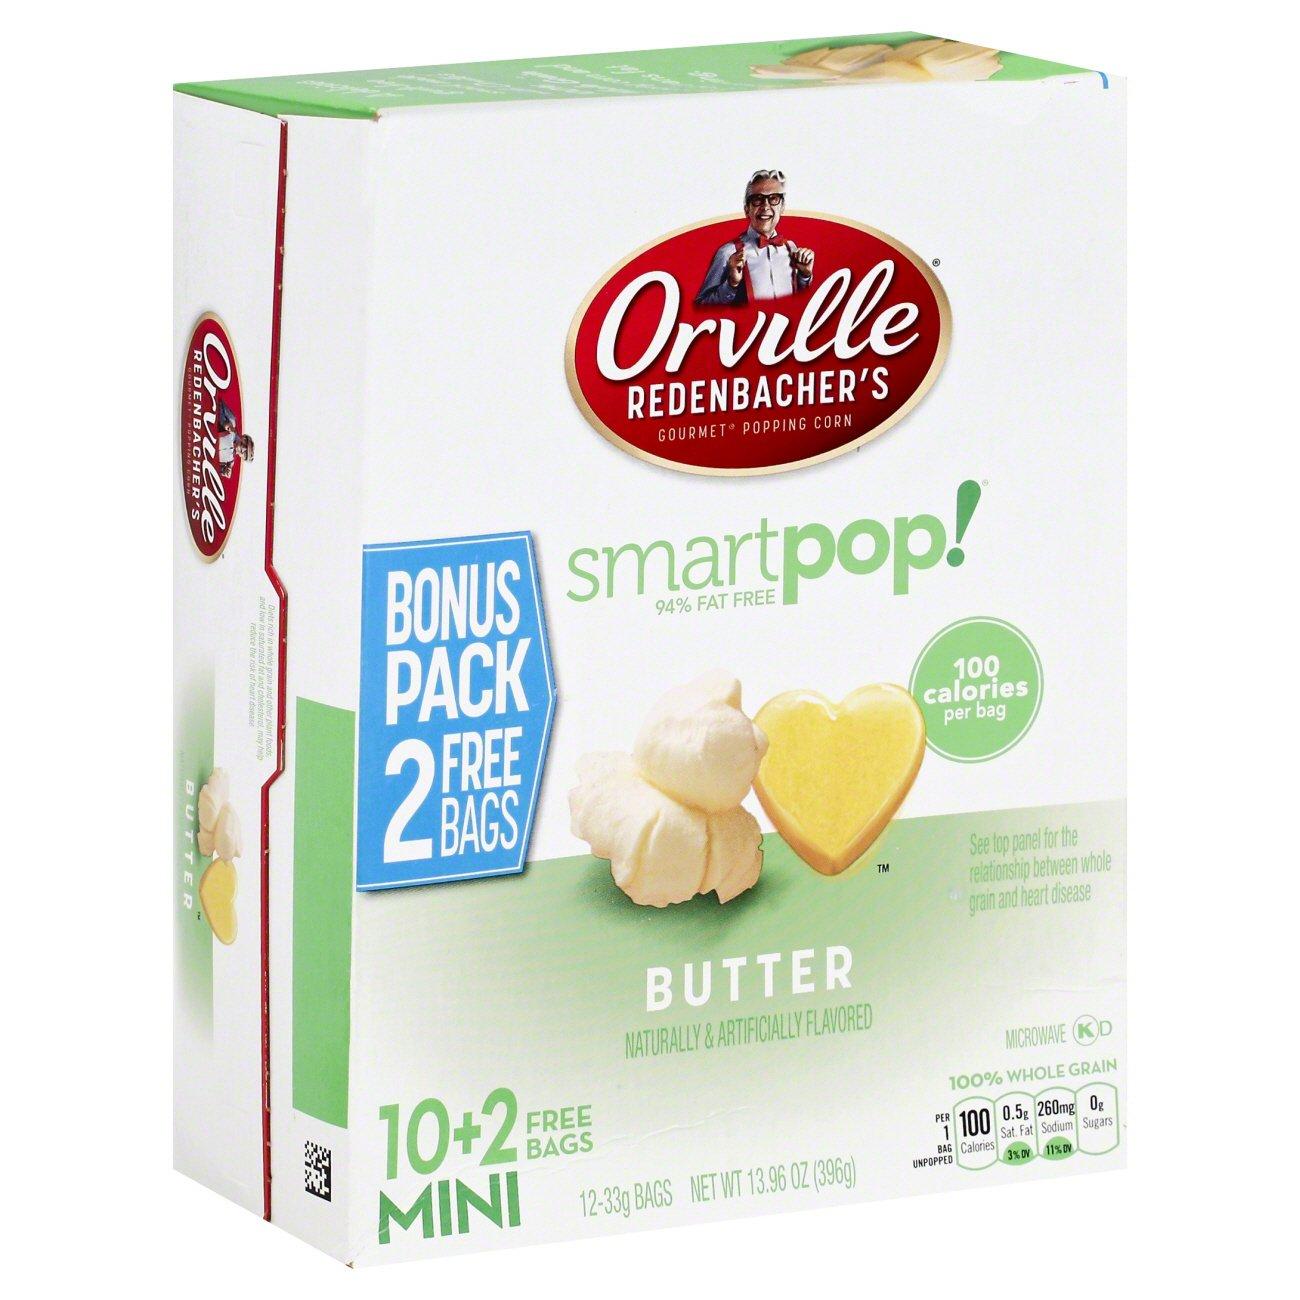 Smart Pop! Microwave Popcorn Mini Bags